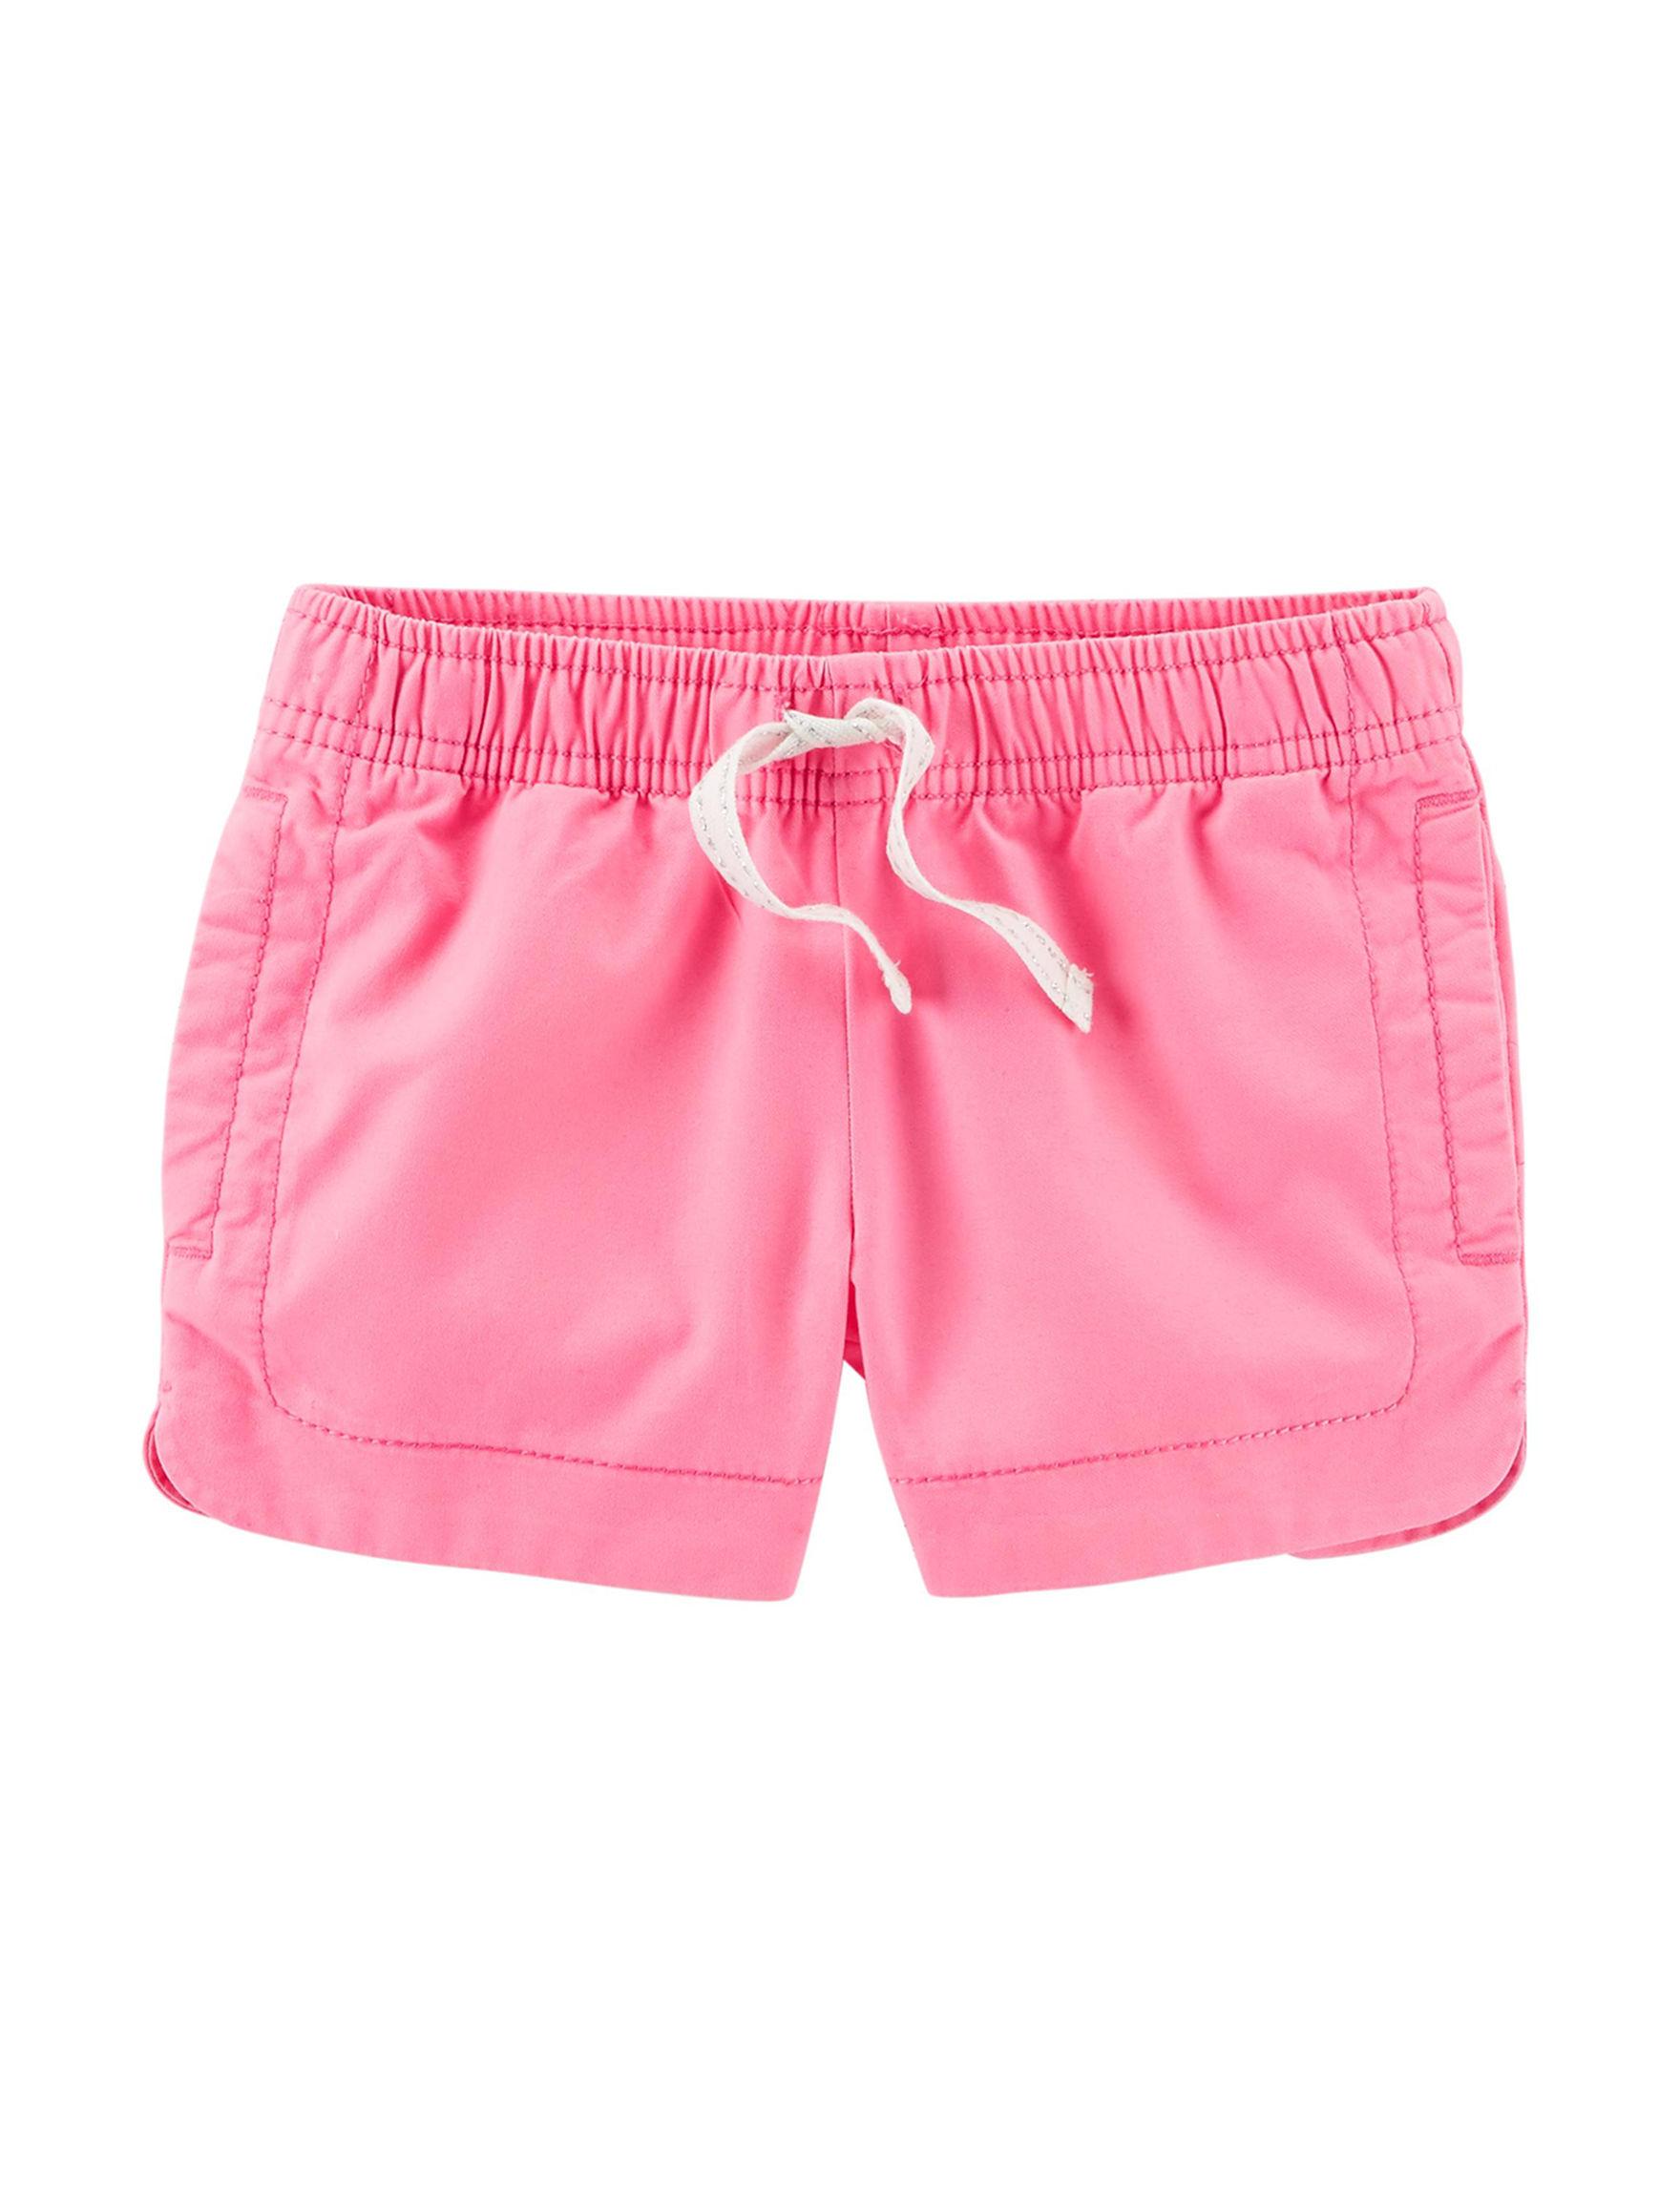 Carter's Pink Loose